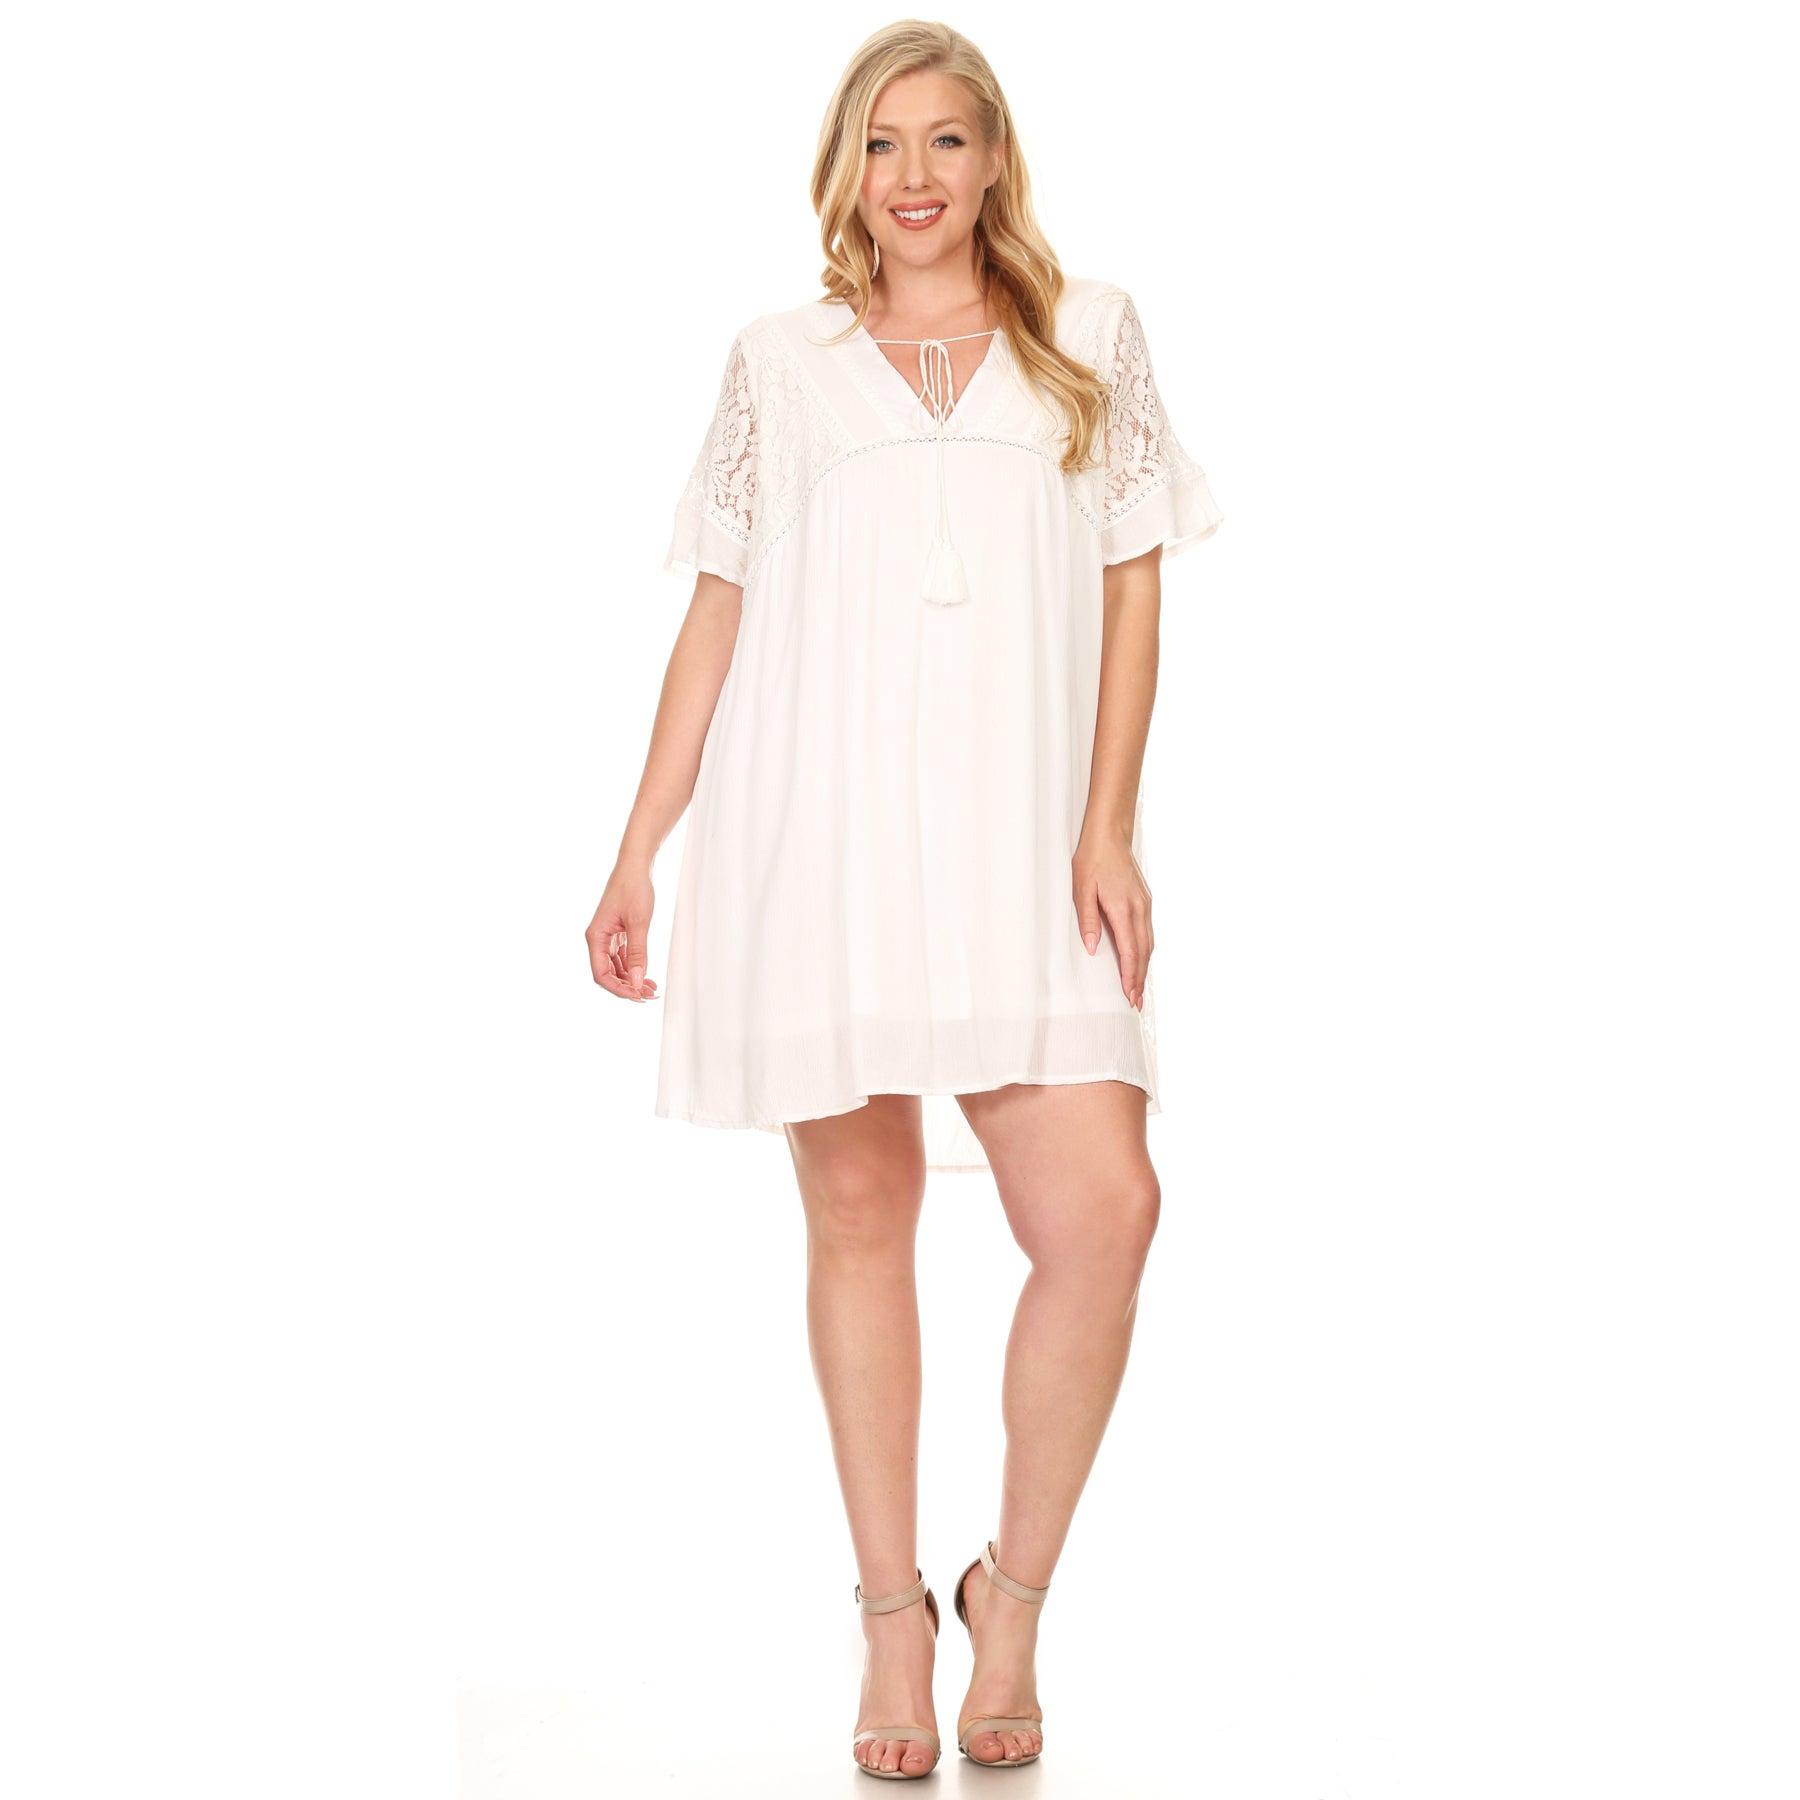 8ab4bbd0f9 Lace Shift Dress Plus Size